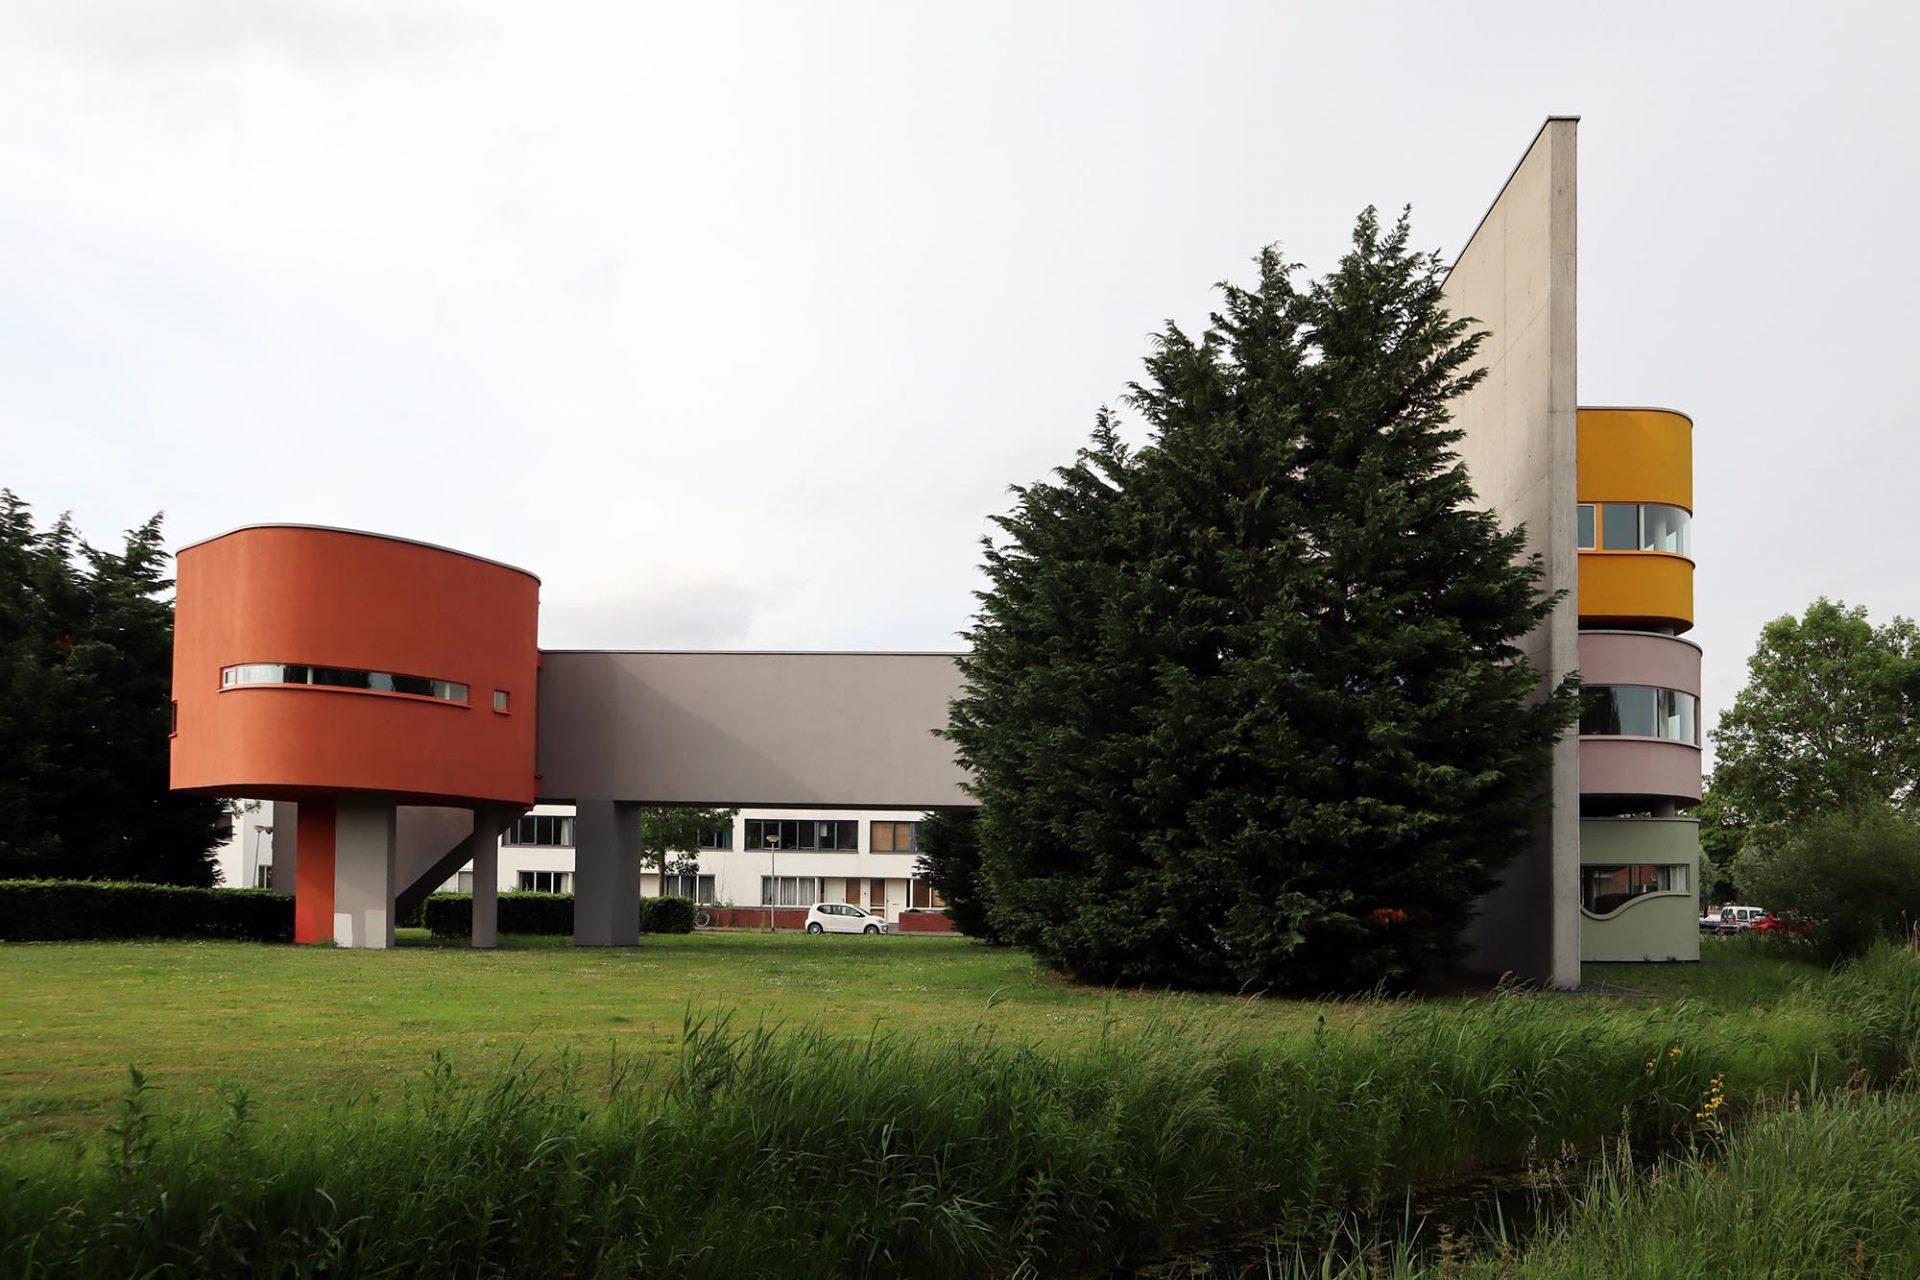 Wall House II. John Hejduk, 2001.